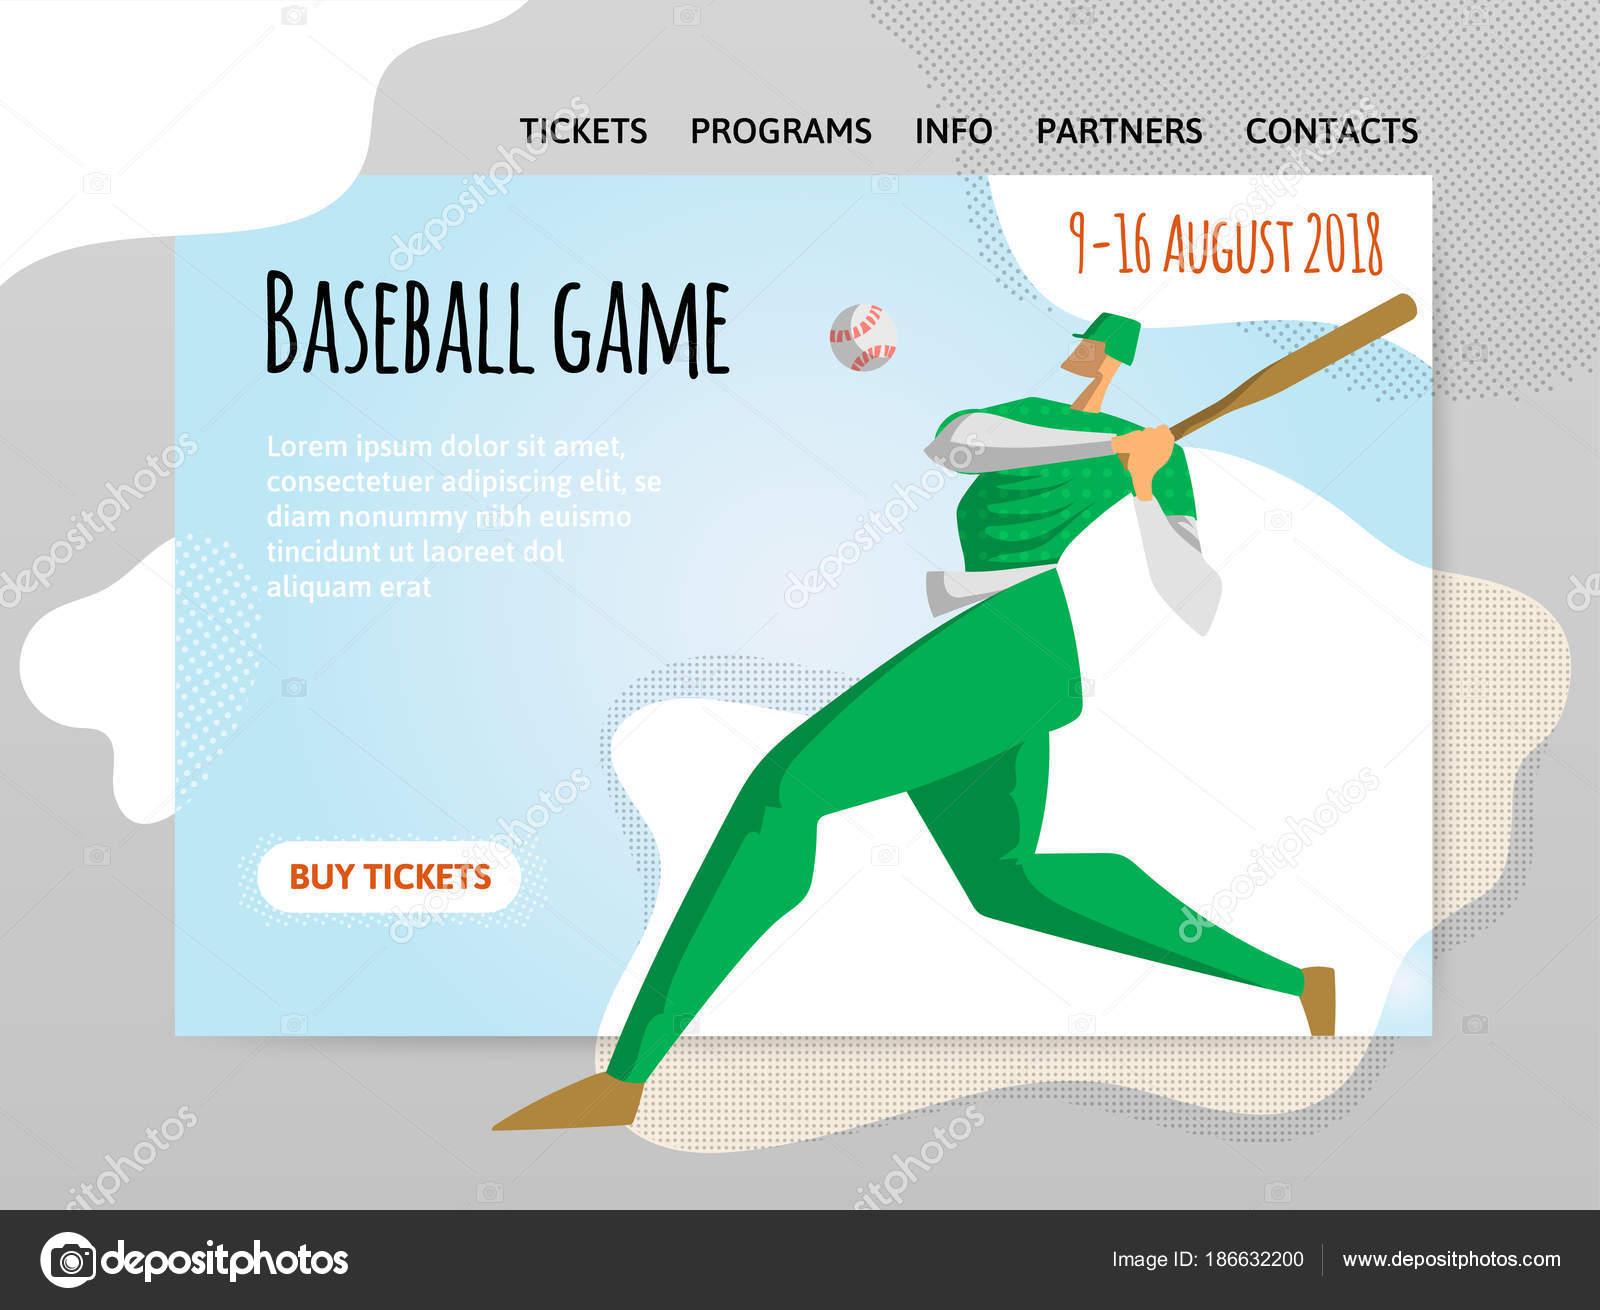 Baseball-Spieler mit Fledermaus. Vektor, Illutration, Design-Vorlage ...